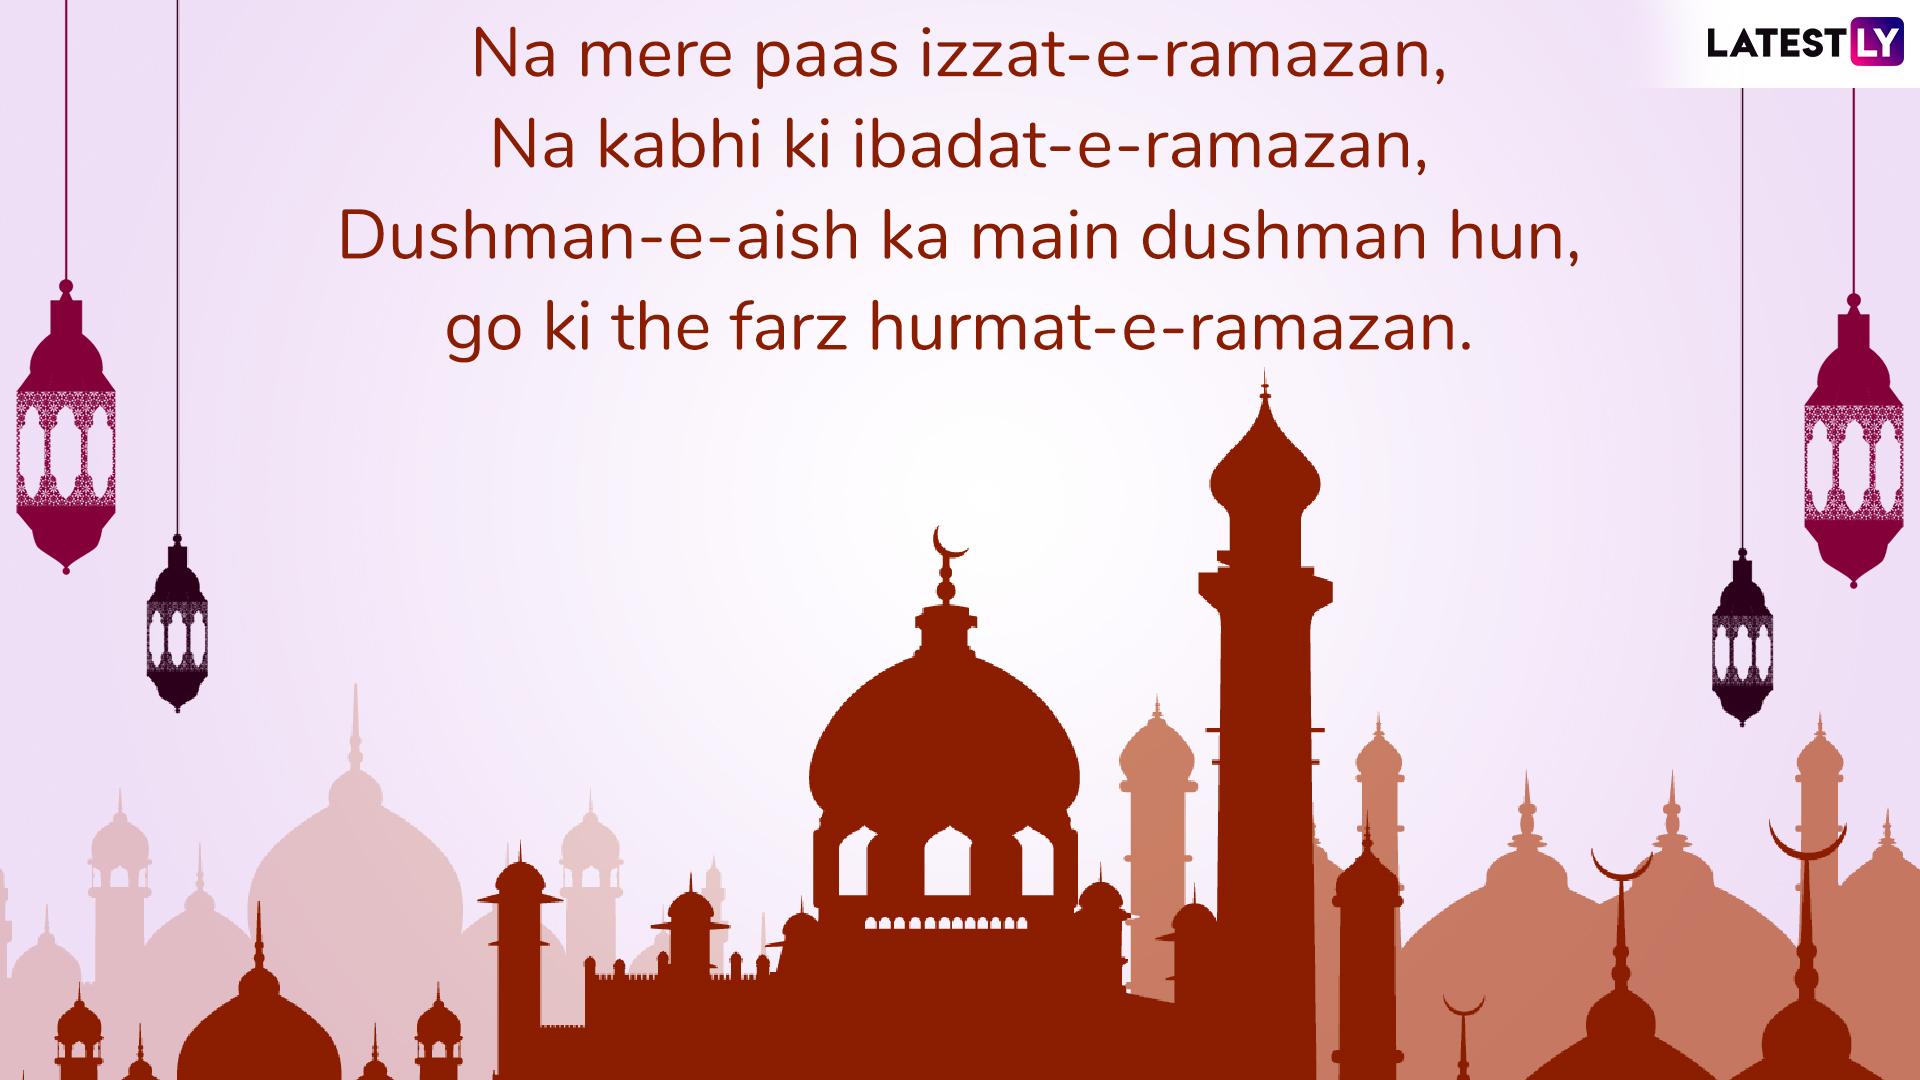 Ramazan 2019 dortmund